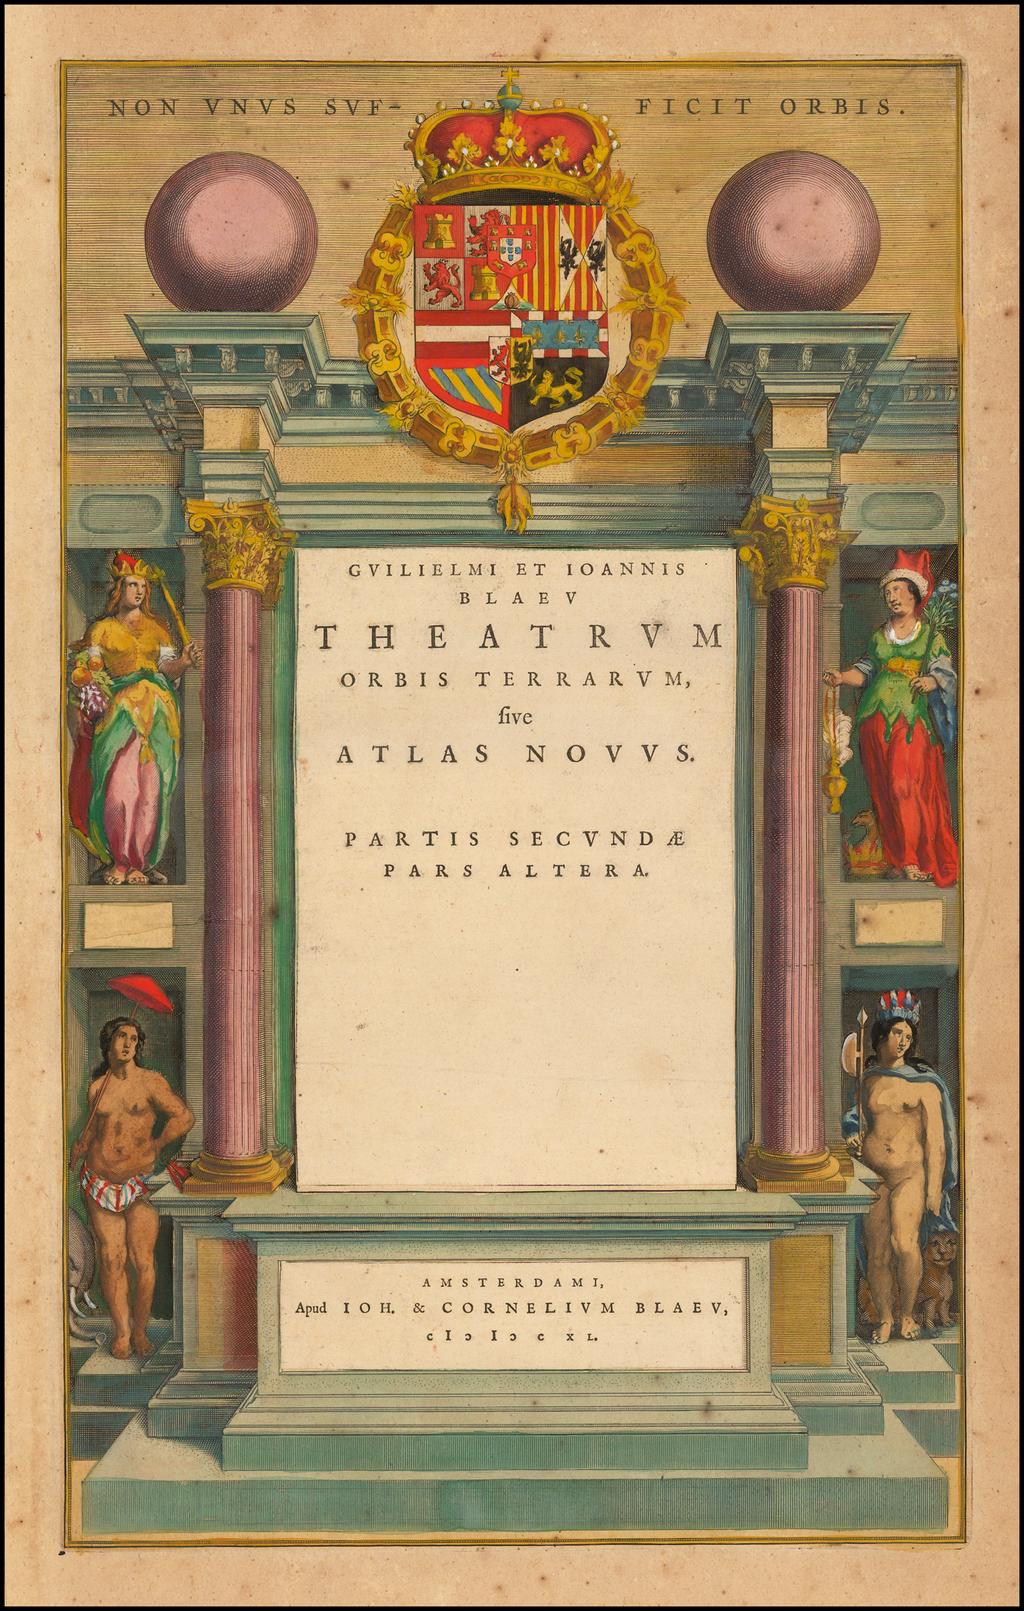 [Title Page] Theatrum Orbis Terrarum, Sive Atlas Novus.  Pars Secunda. By Willem Janszoon Blaeu